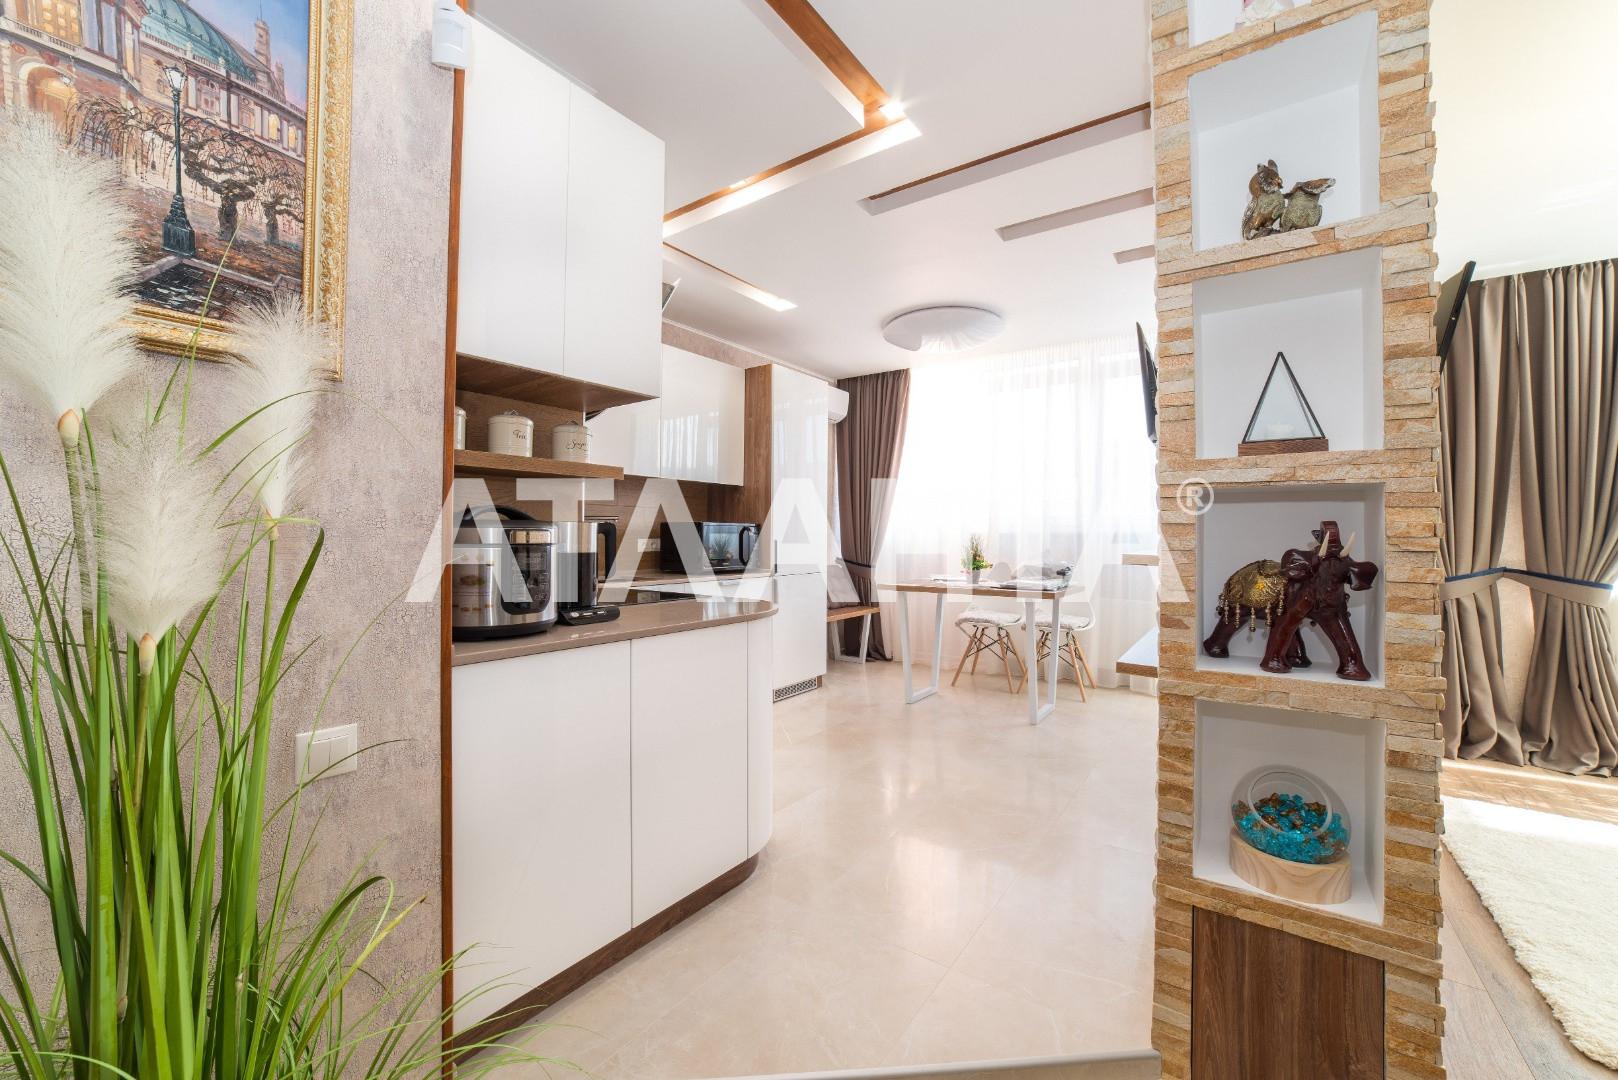 Продается 1-комнатная Квартира на ул. Балковская (Фрунзе) — 50 000 у.е.